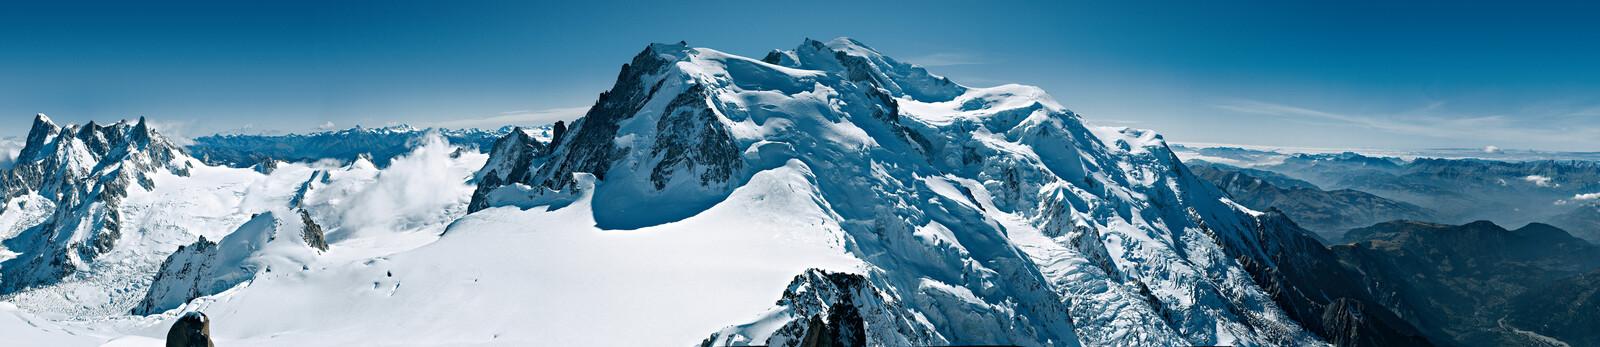 Massif du Mont Blanc - Rudolf Rother